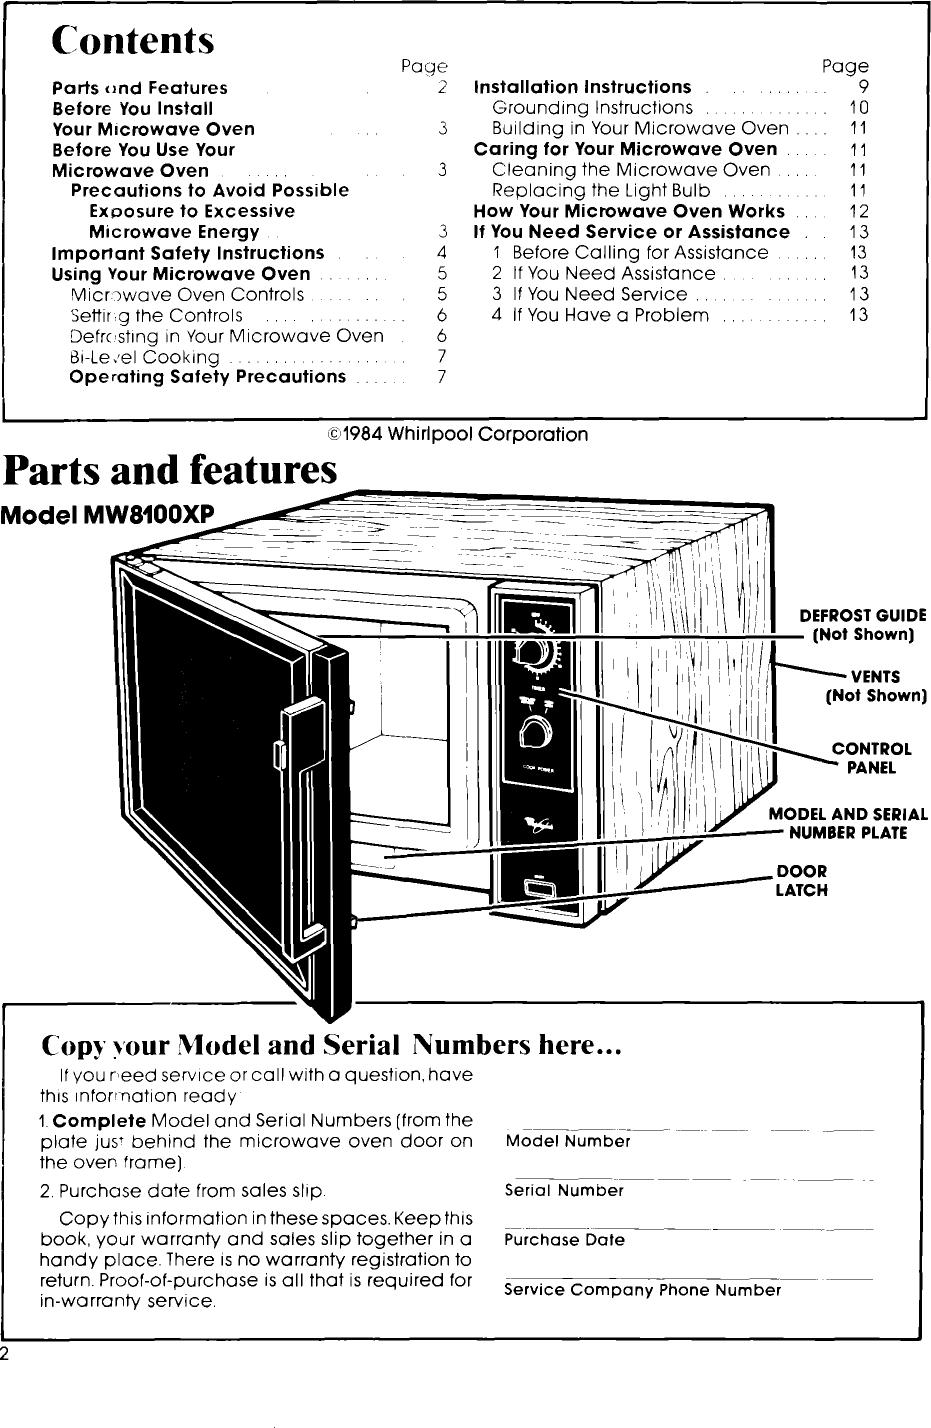 WHIRLPOOL Countertop Microwave Manual L0805113